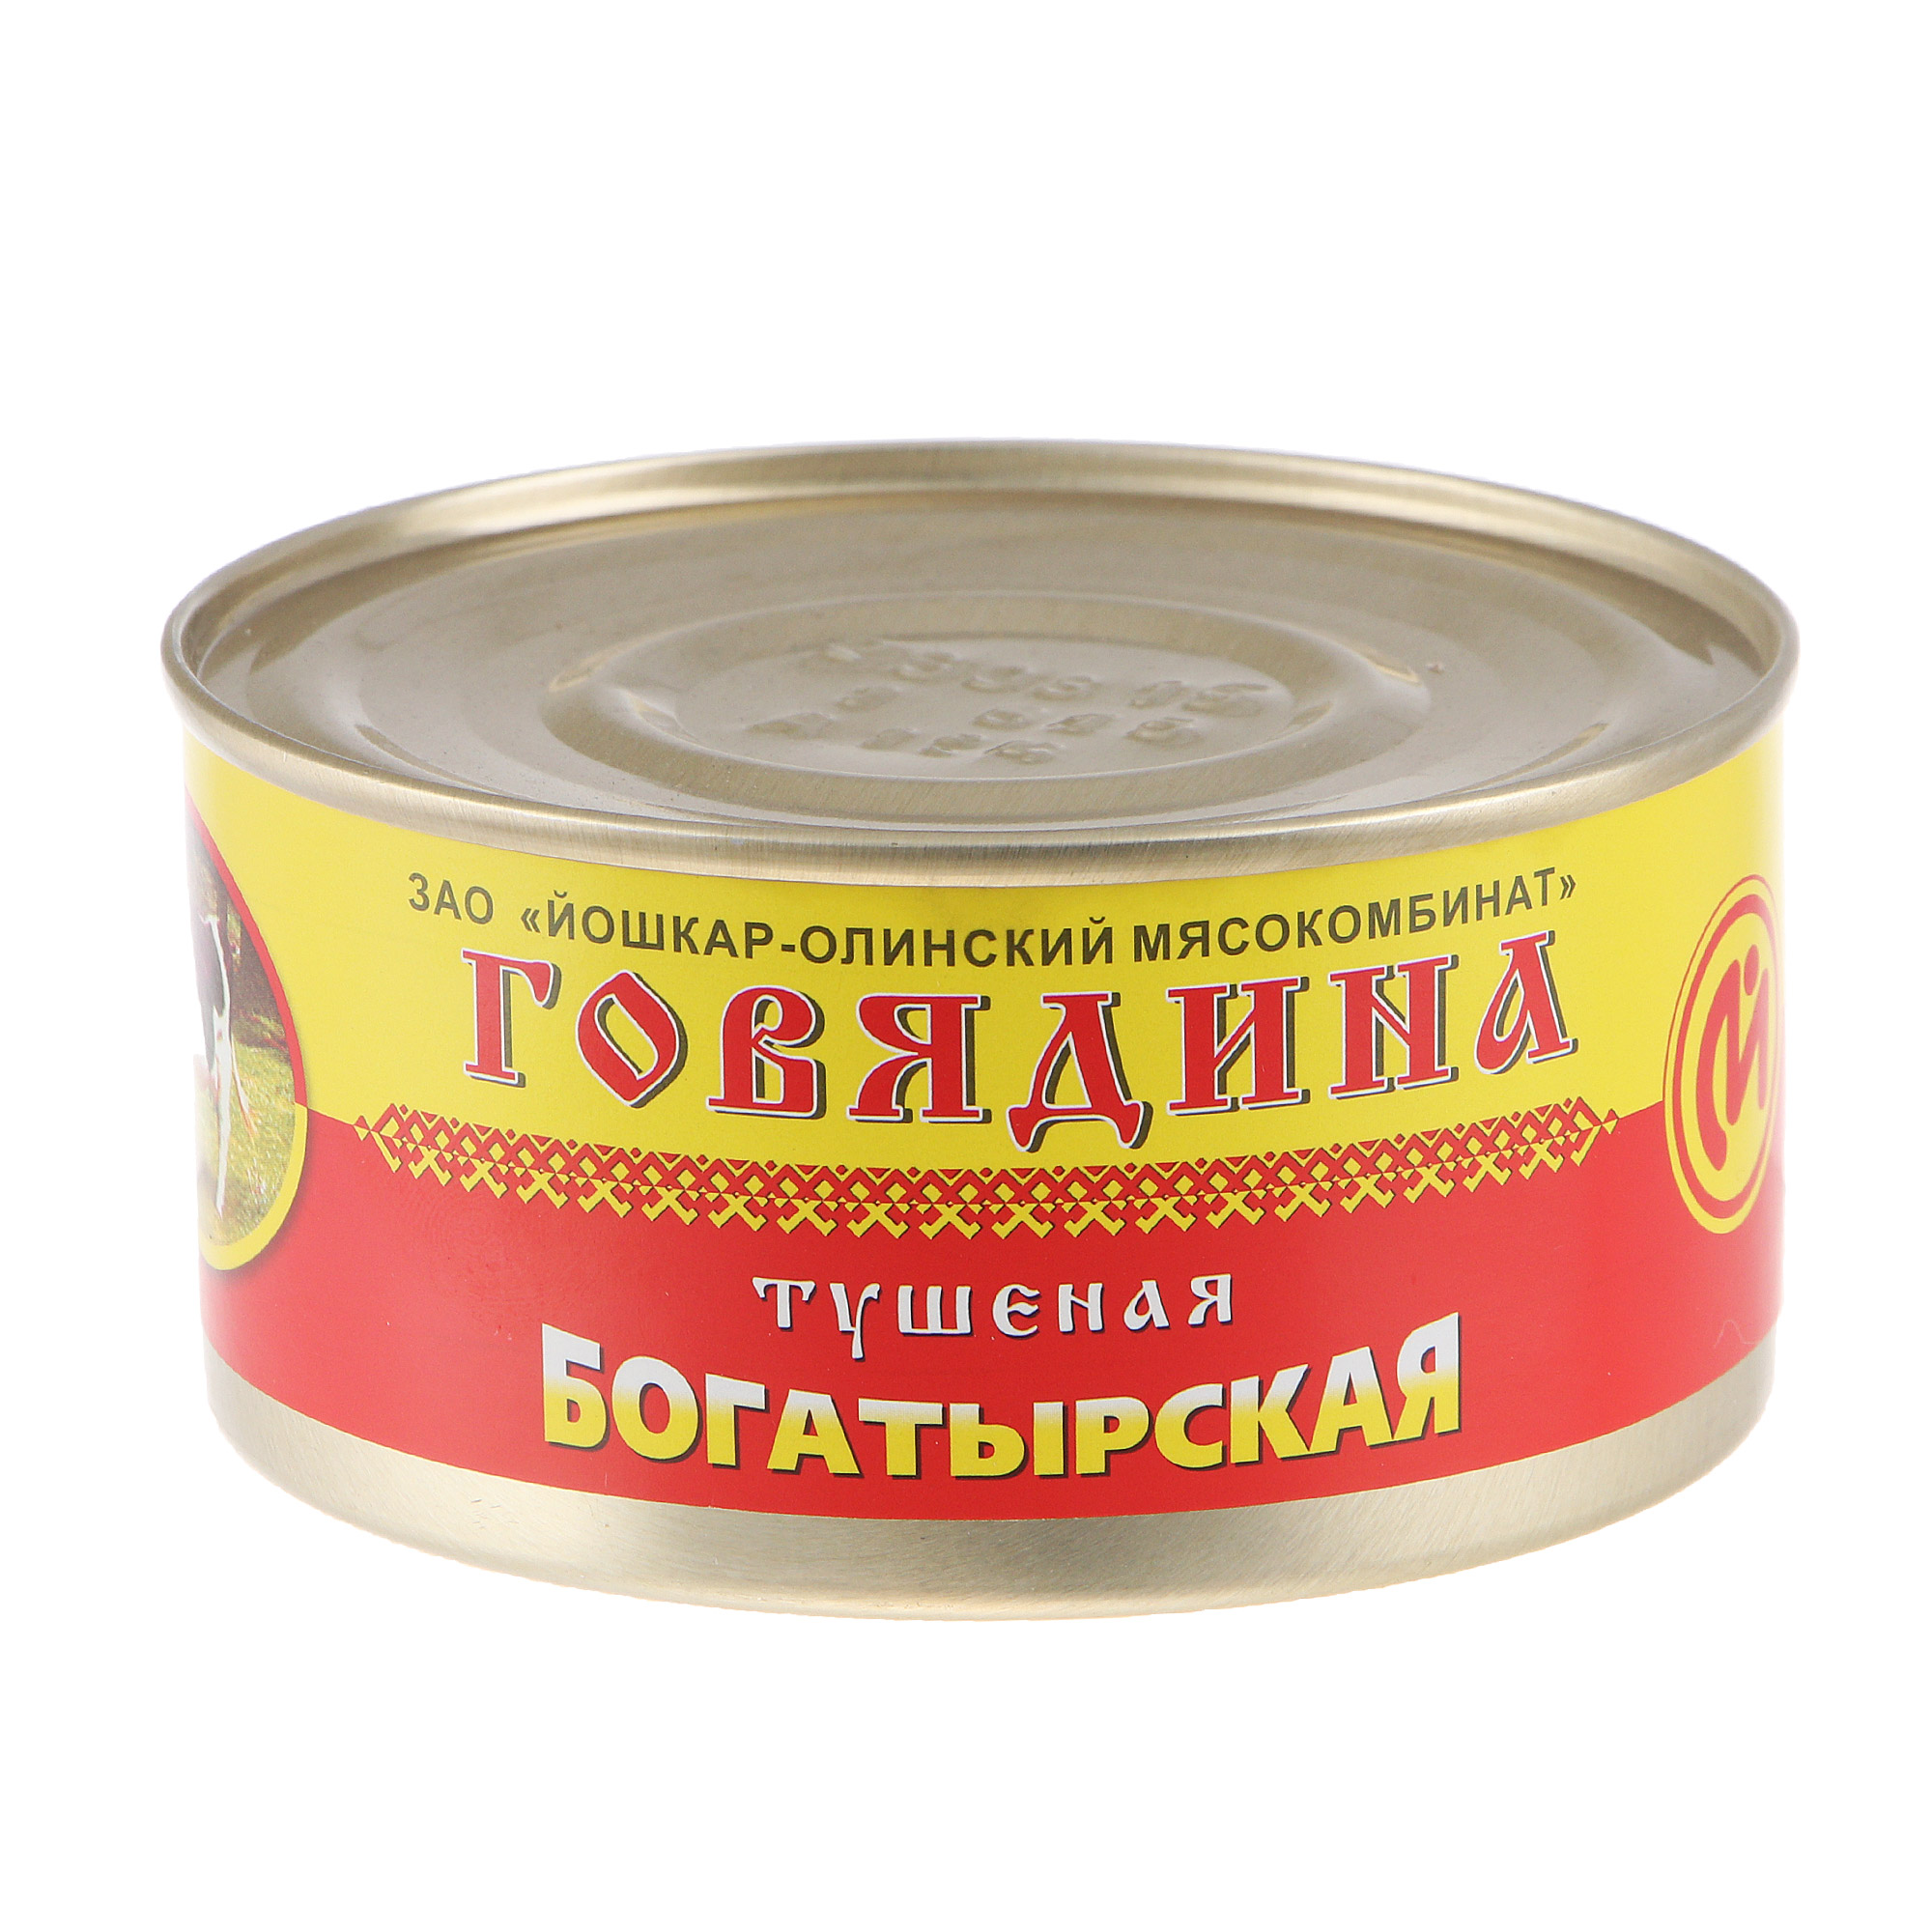 Говядина тушеная Йошкар-Олинский МК Богатырская 325 г